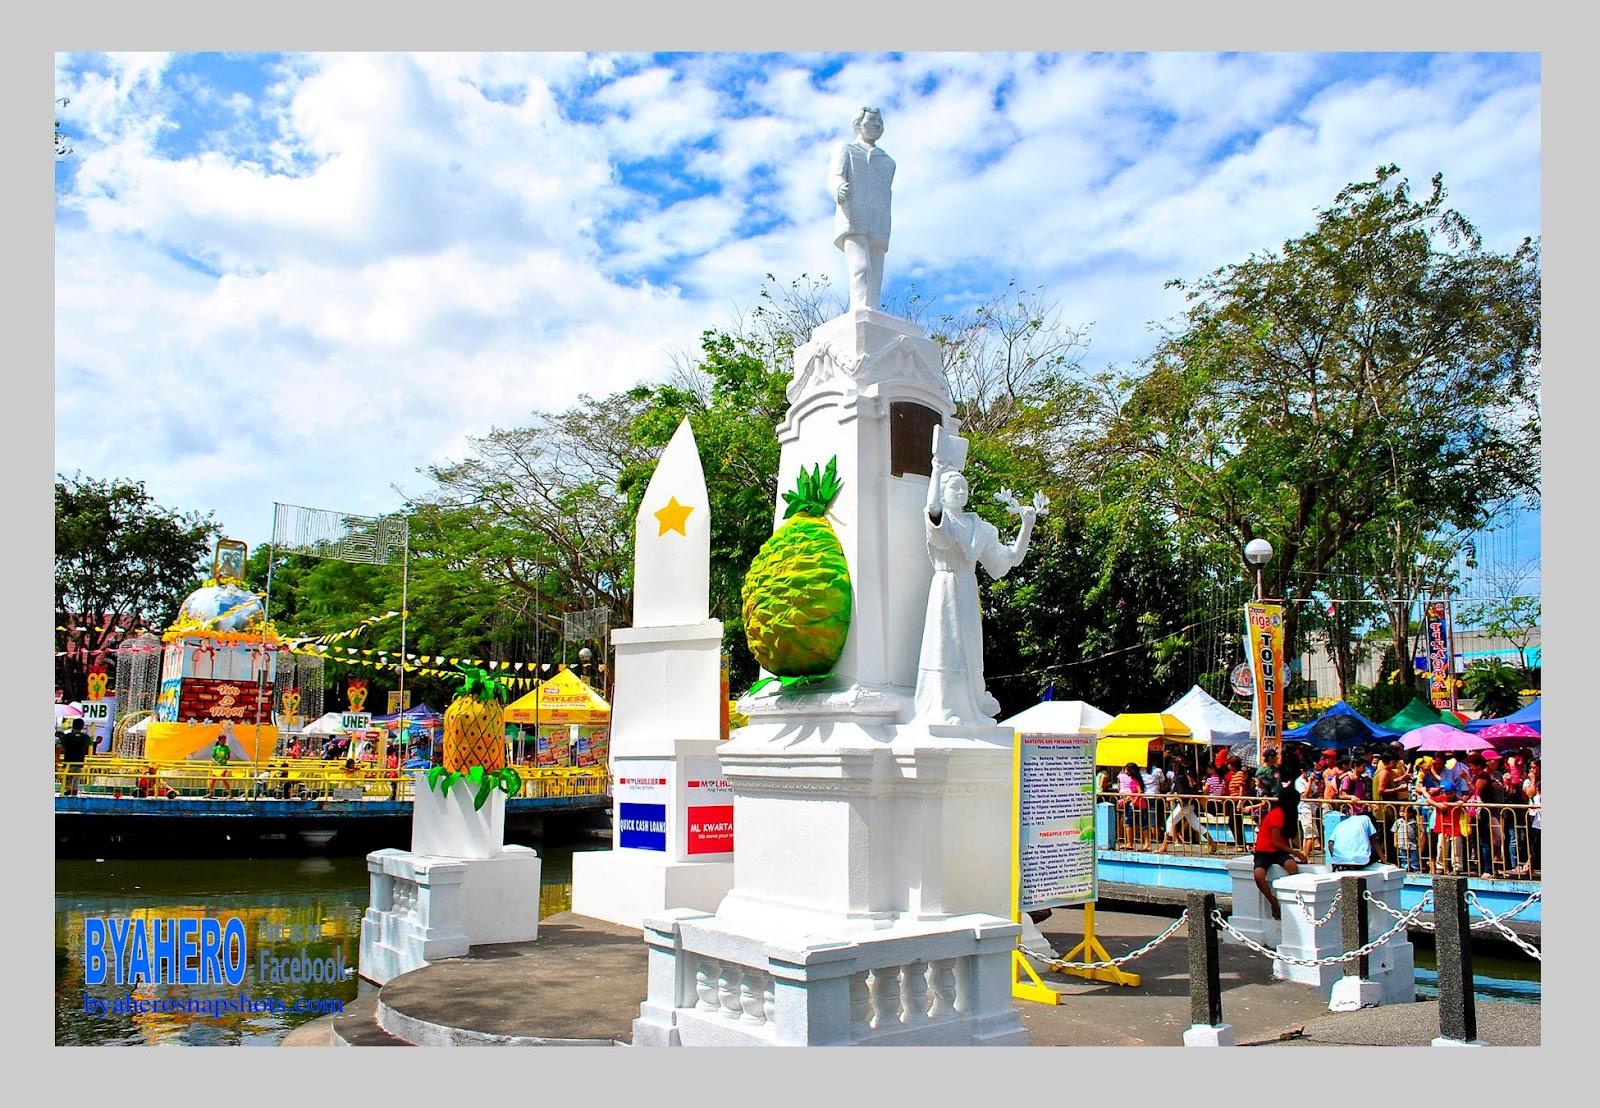 Iriga City Philippines  City pictures : Byahero: Jose Rizal Monument in Iriga City, Camarines Sur